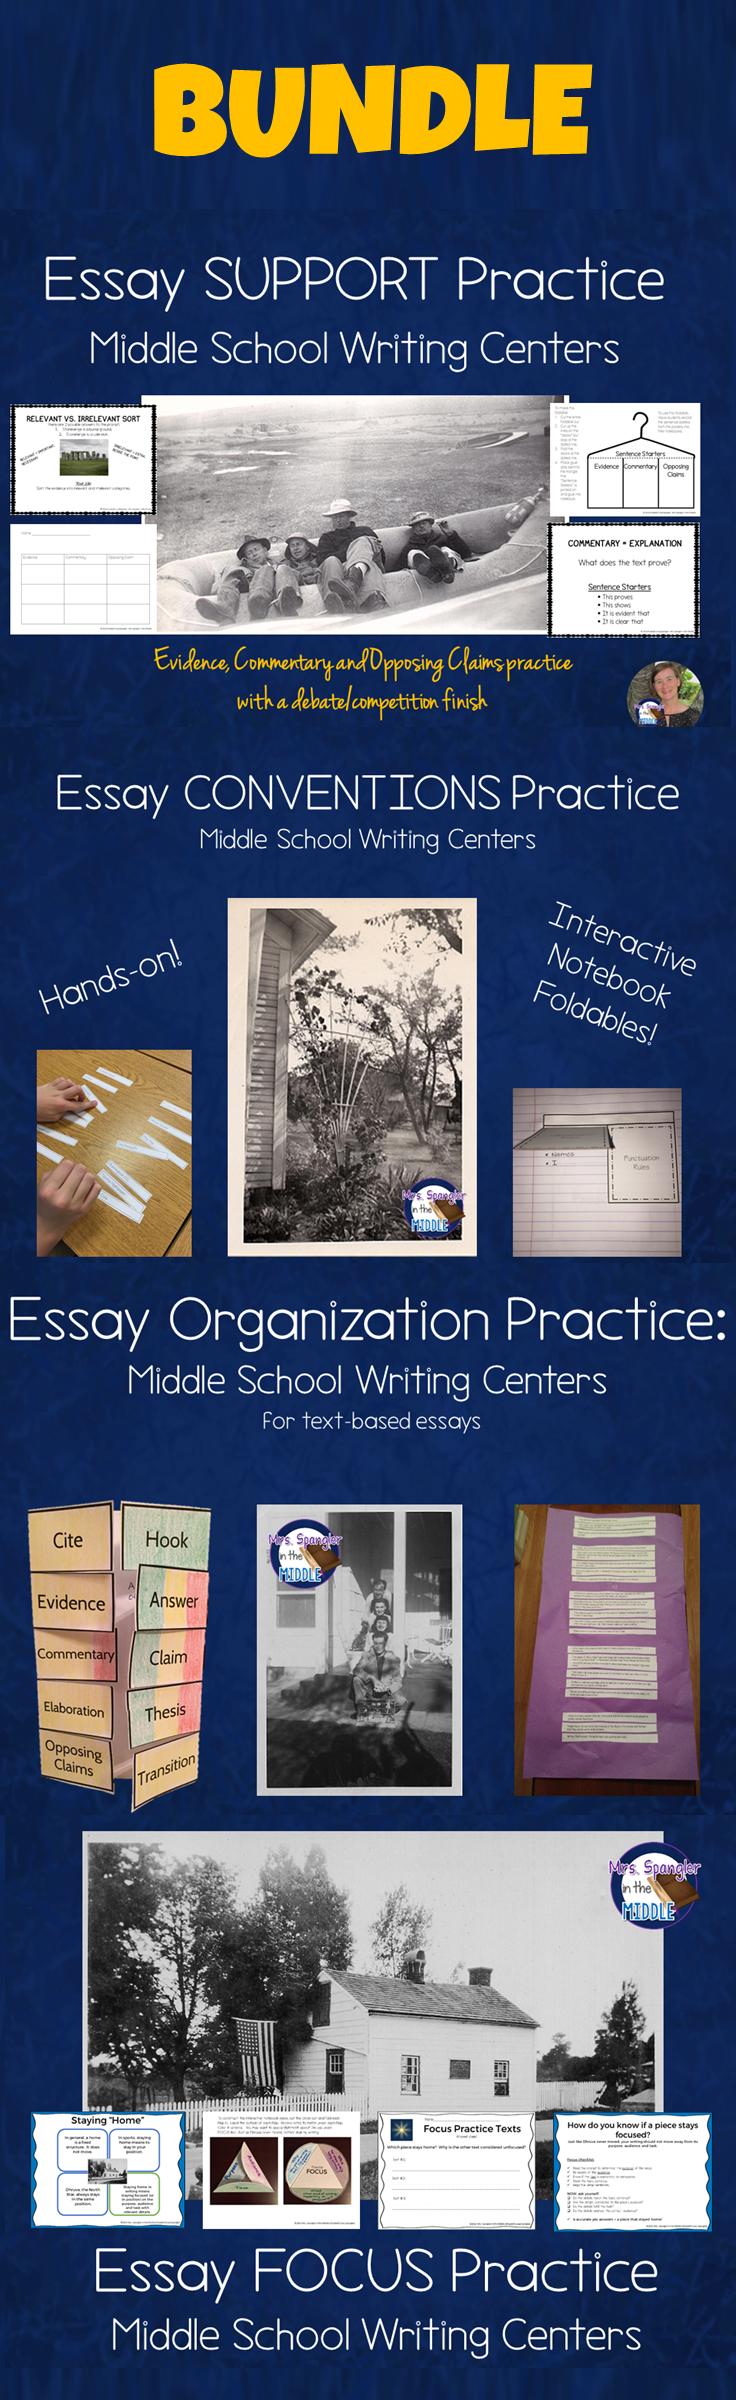 Orderliness essay